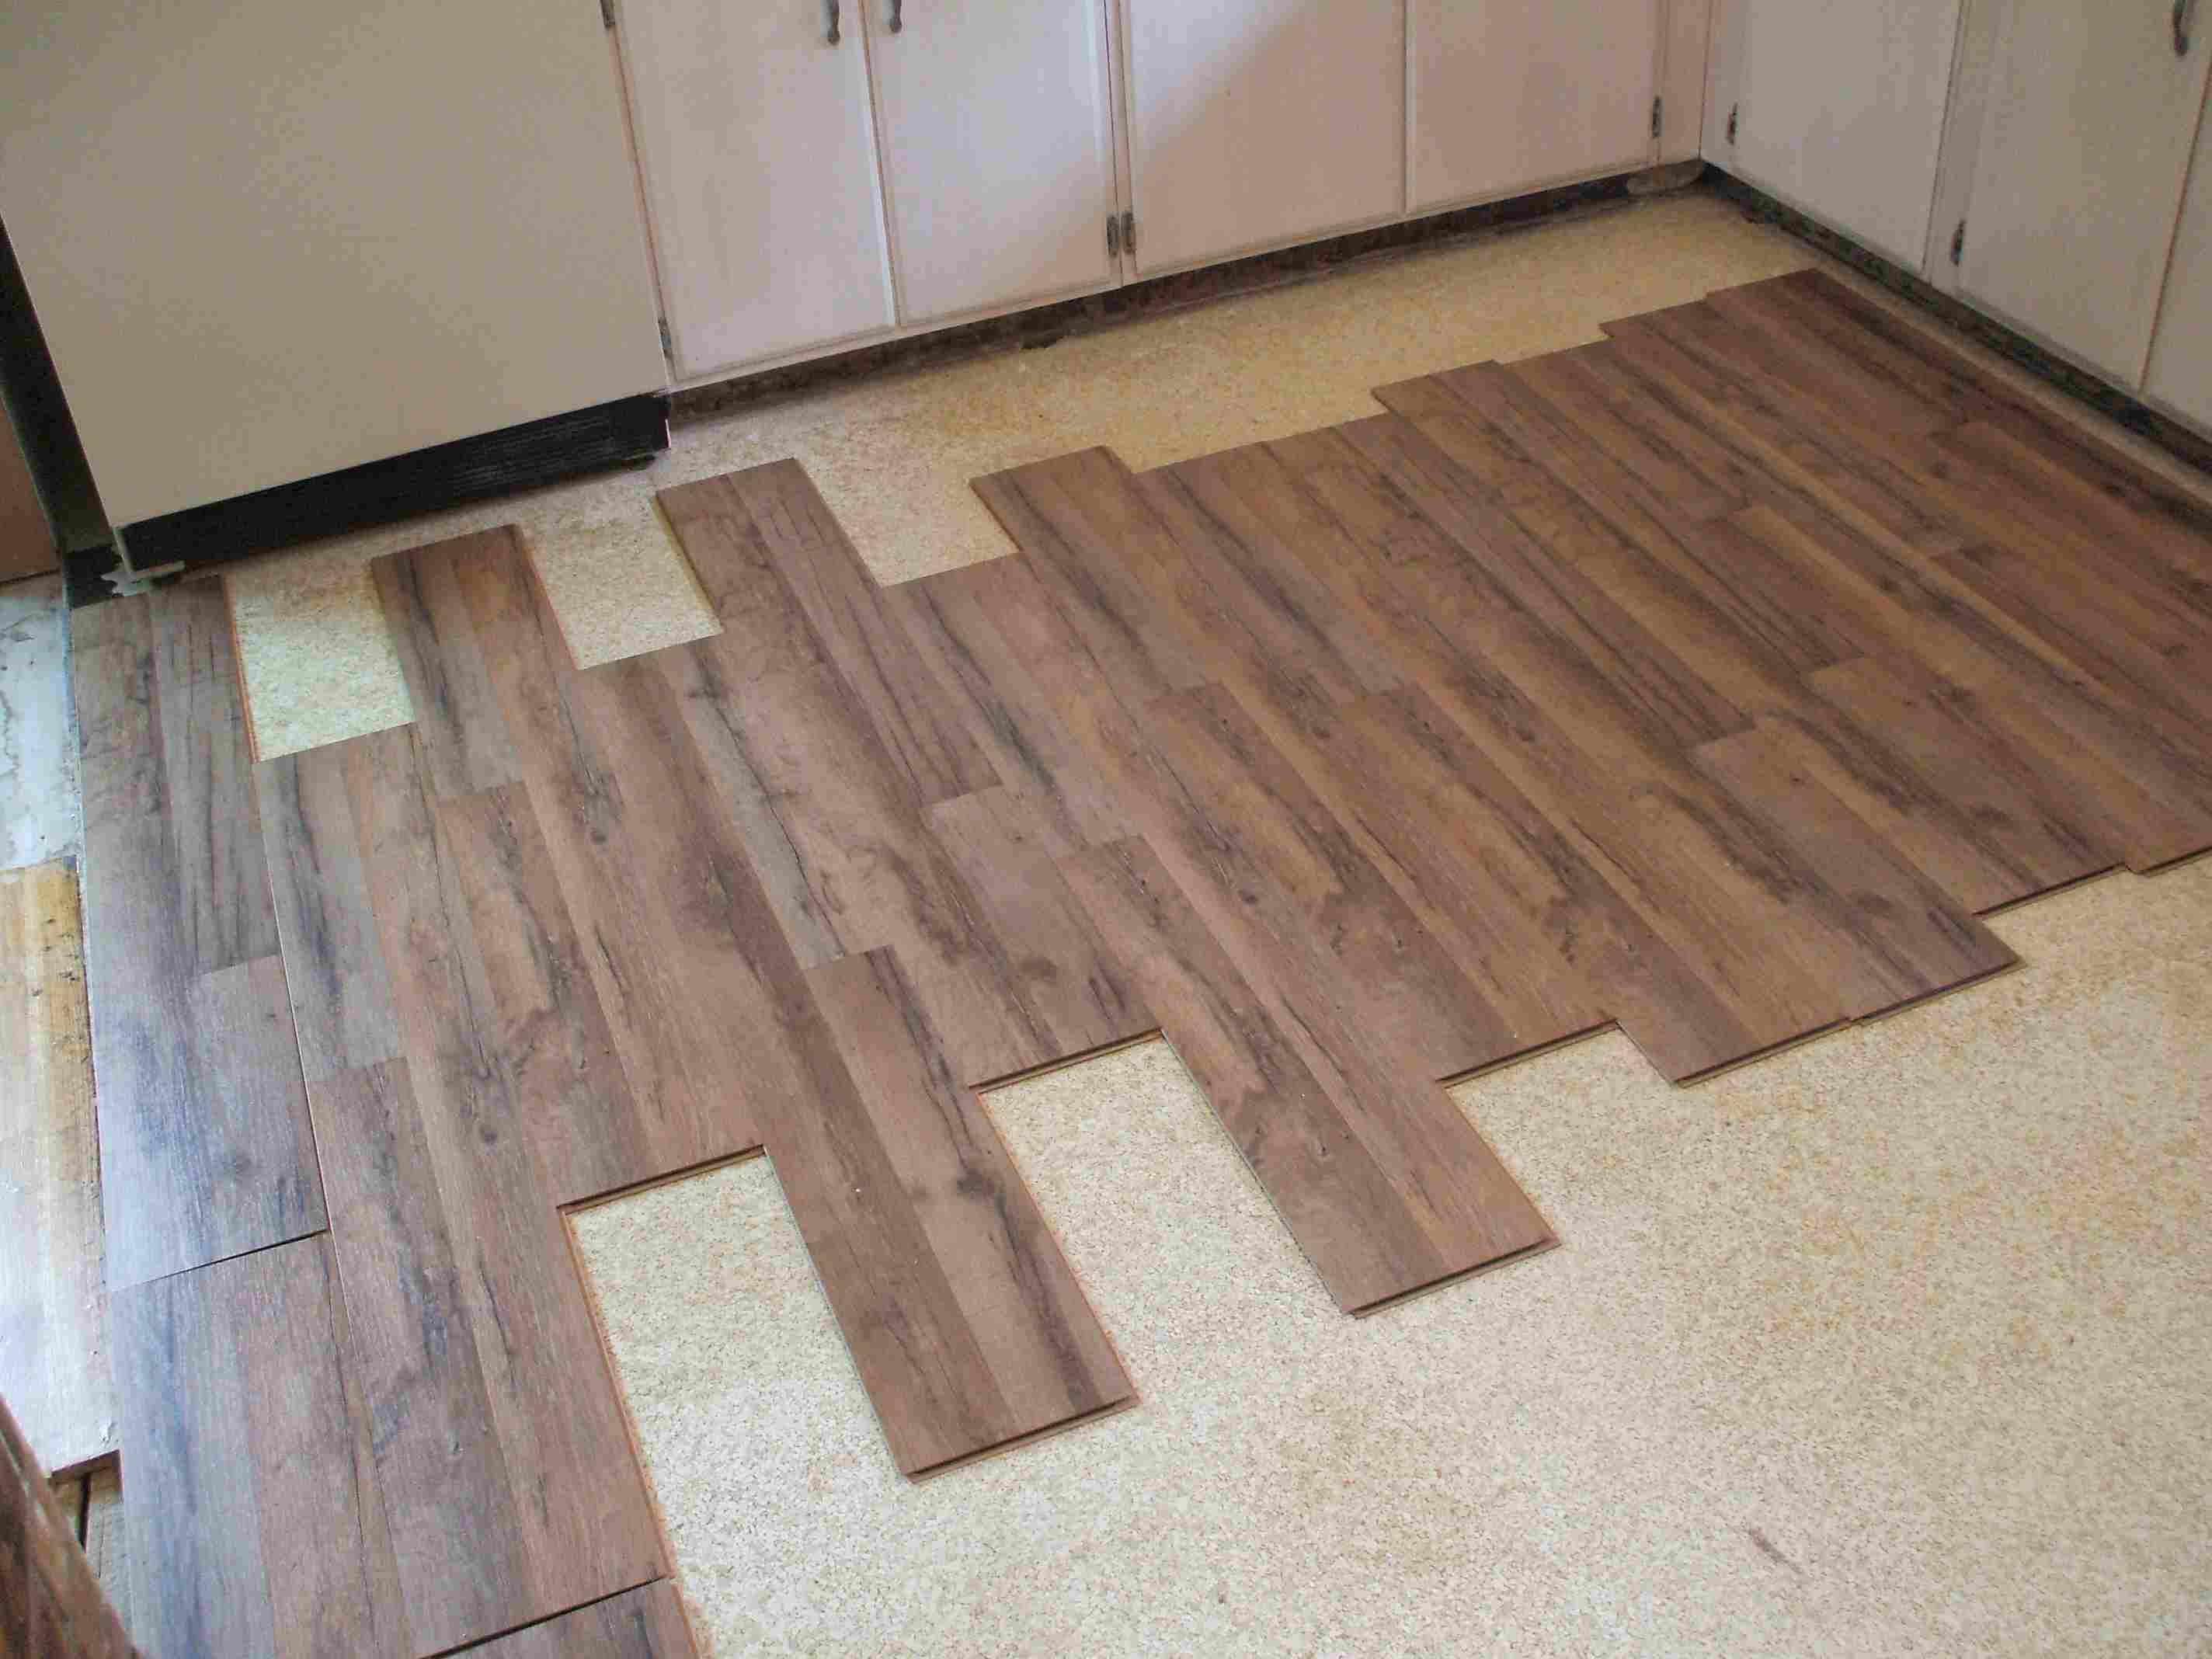 length of hardwood flooring planks of laminate flooring installation made easy with installing laminate eyeballing layout 56a49d075f9b58b7d0d7d693 jpg